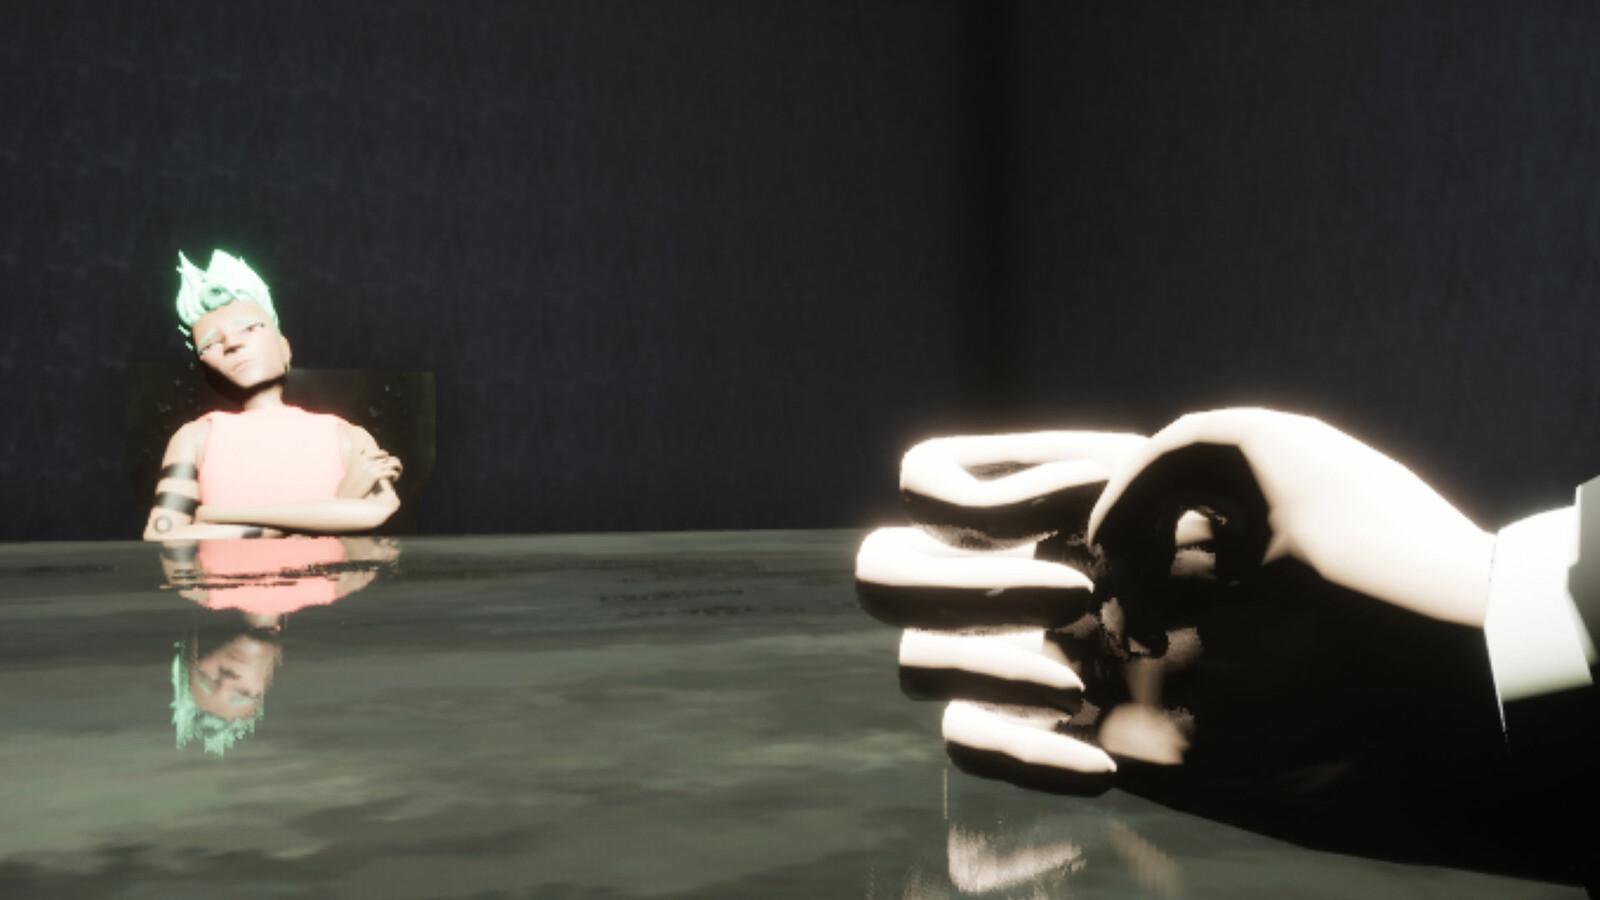 Still taken from opening cutscene where Reno is in the interrogation room